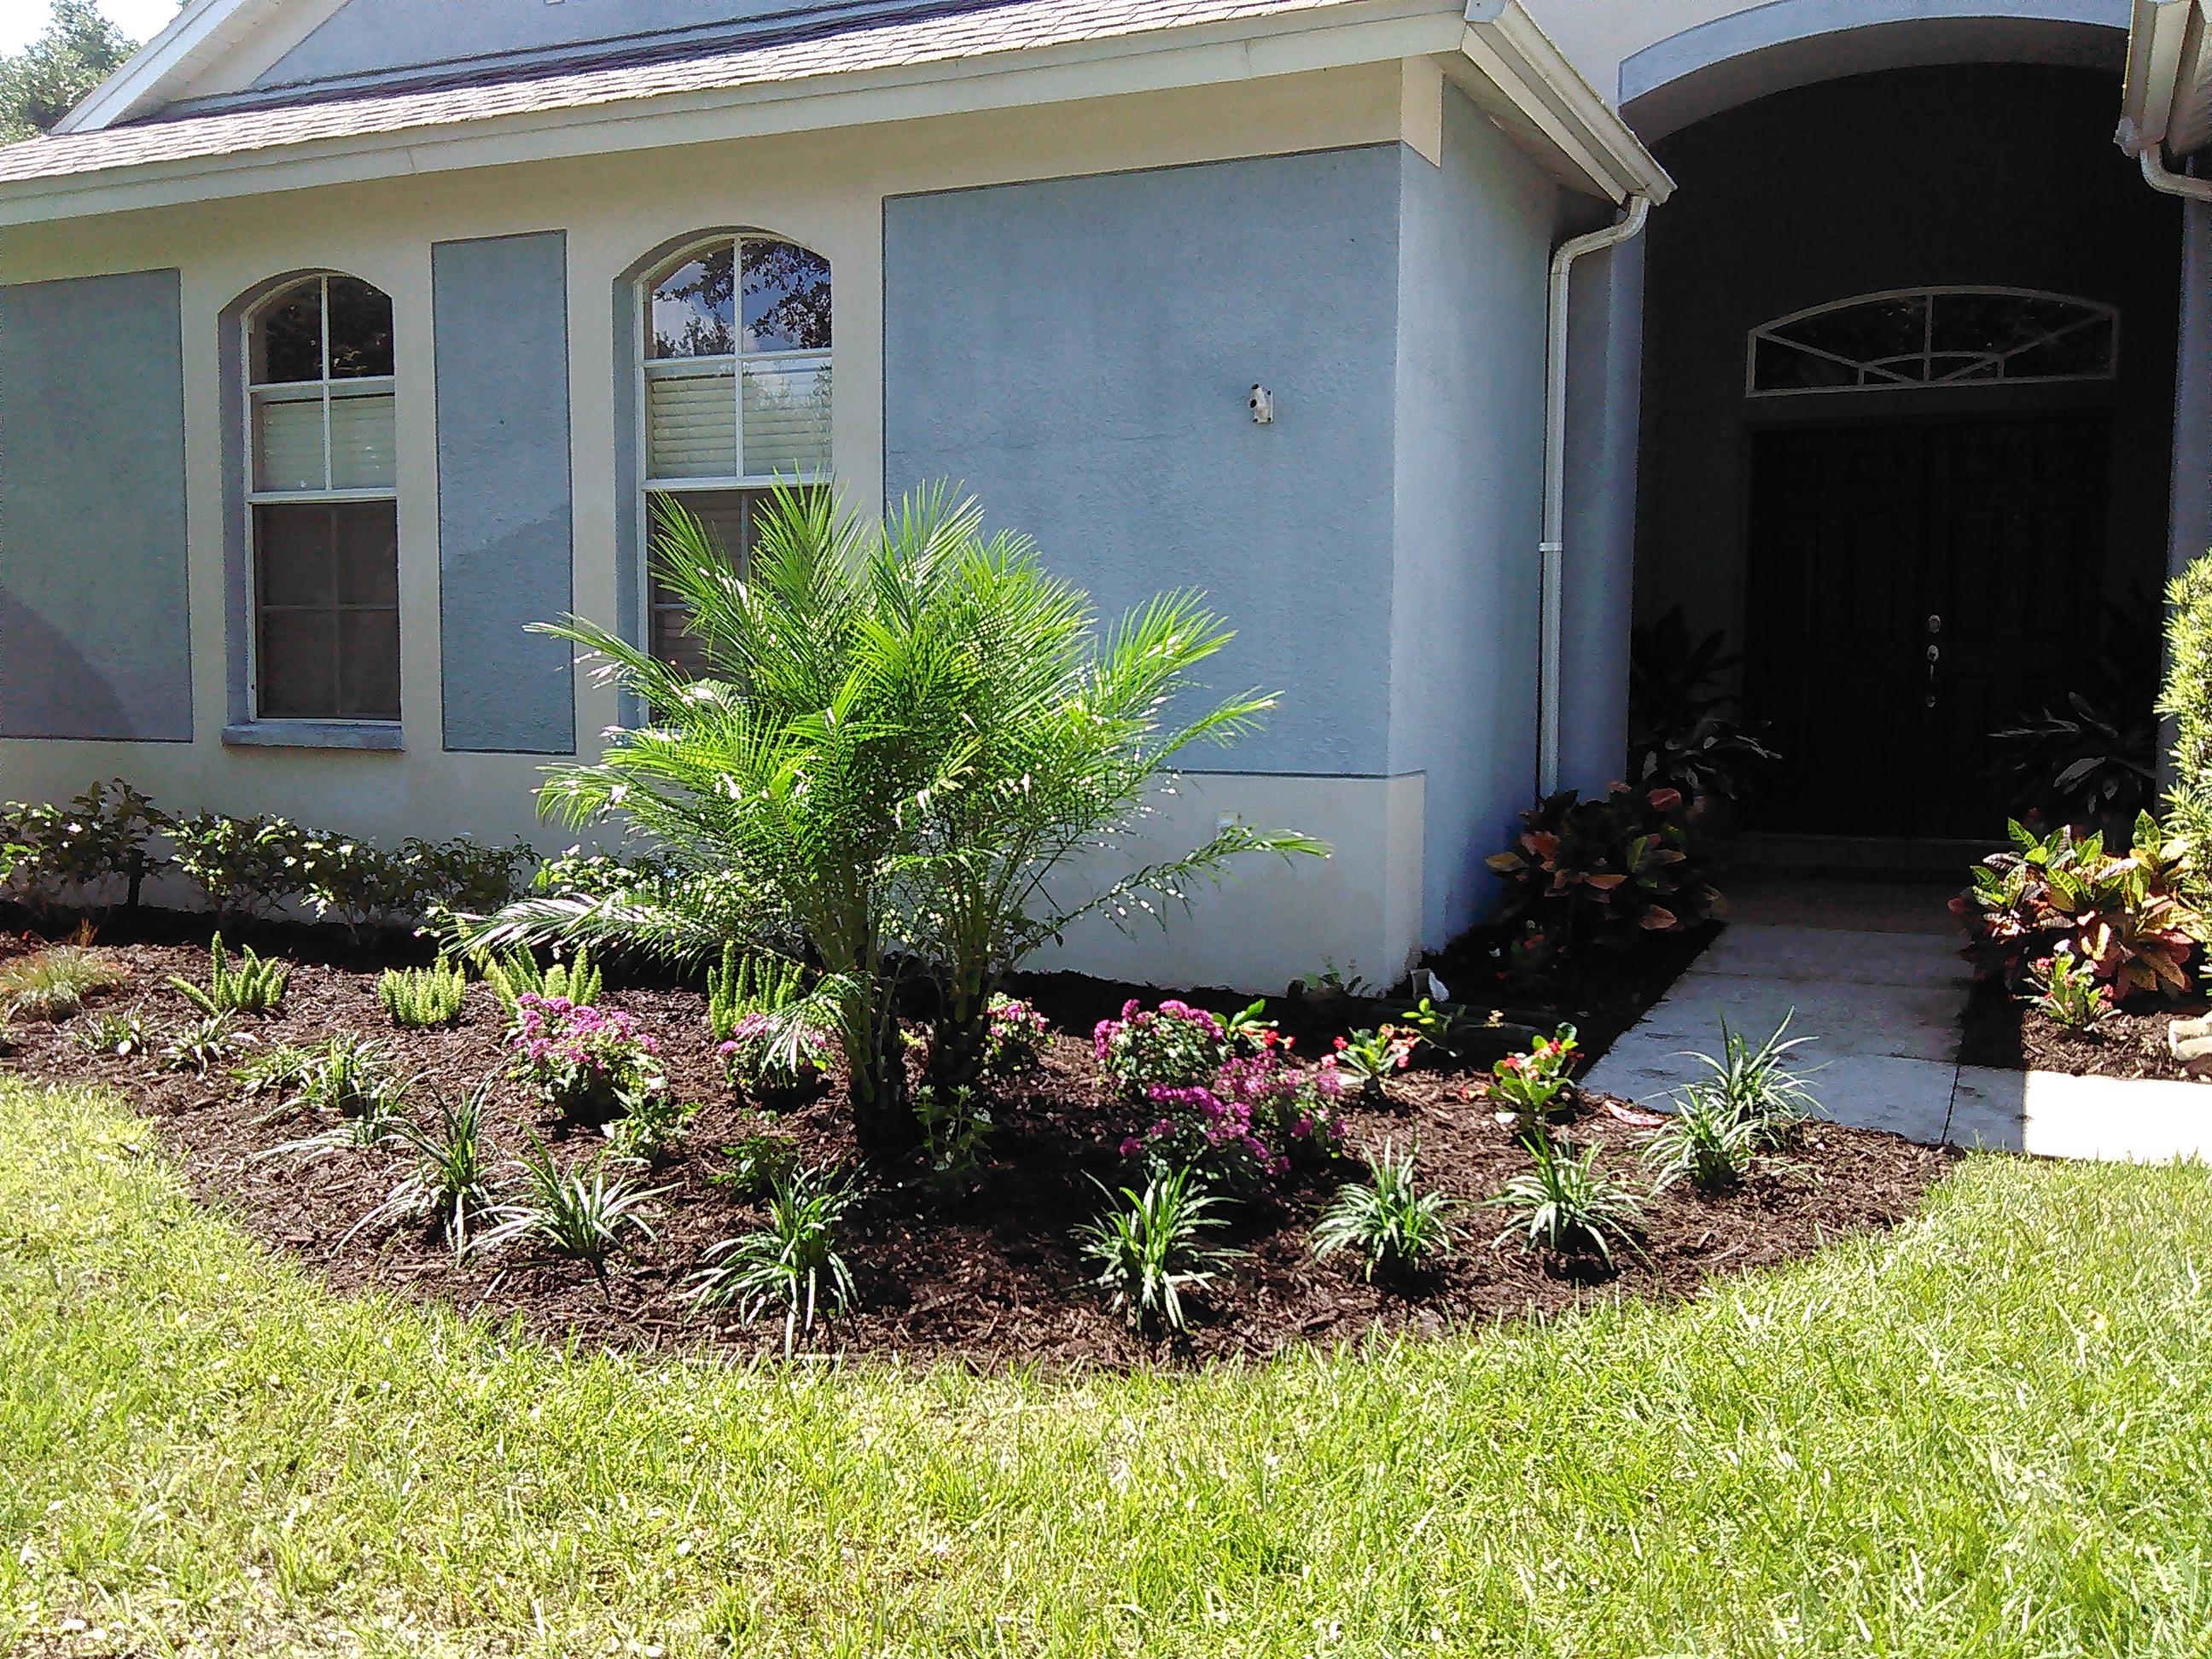 Johns Palms Landscaping image 8